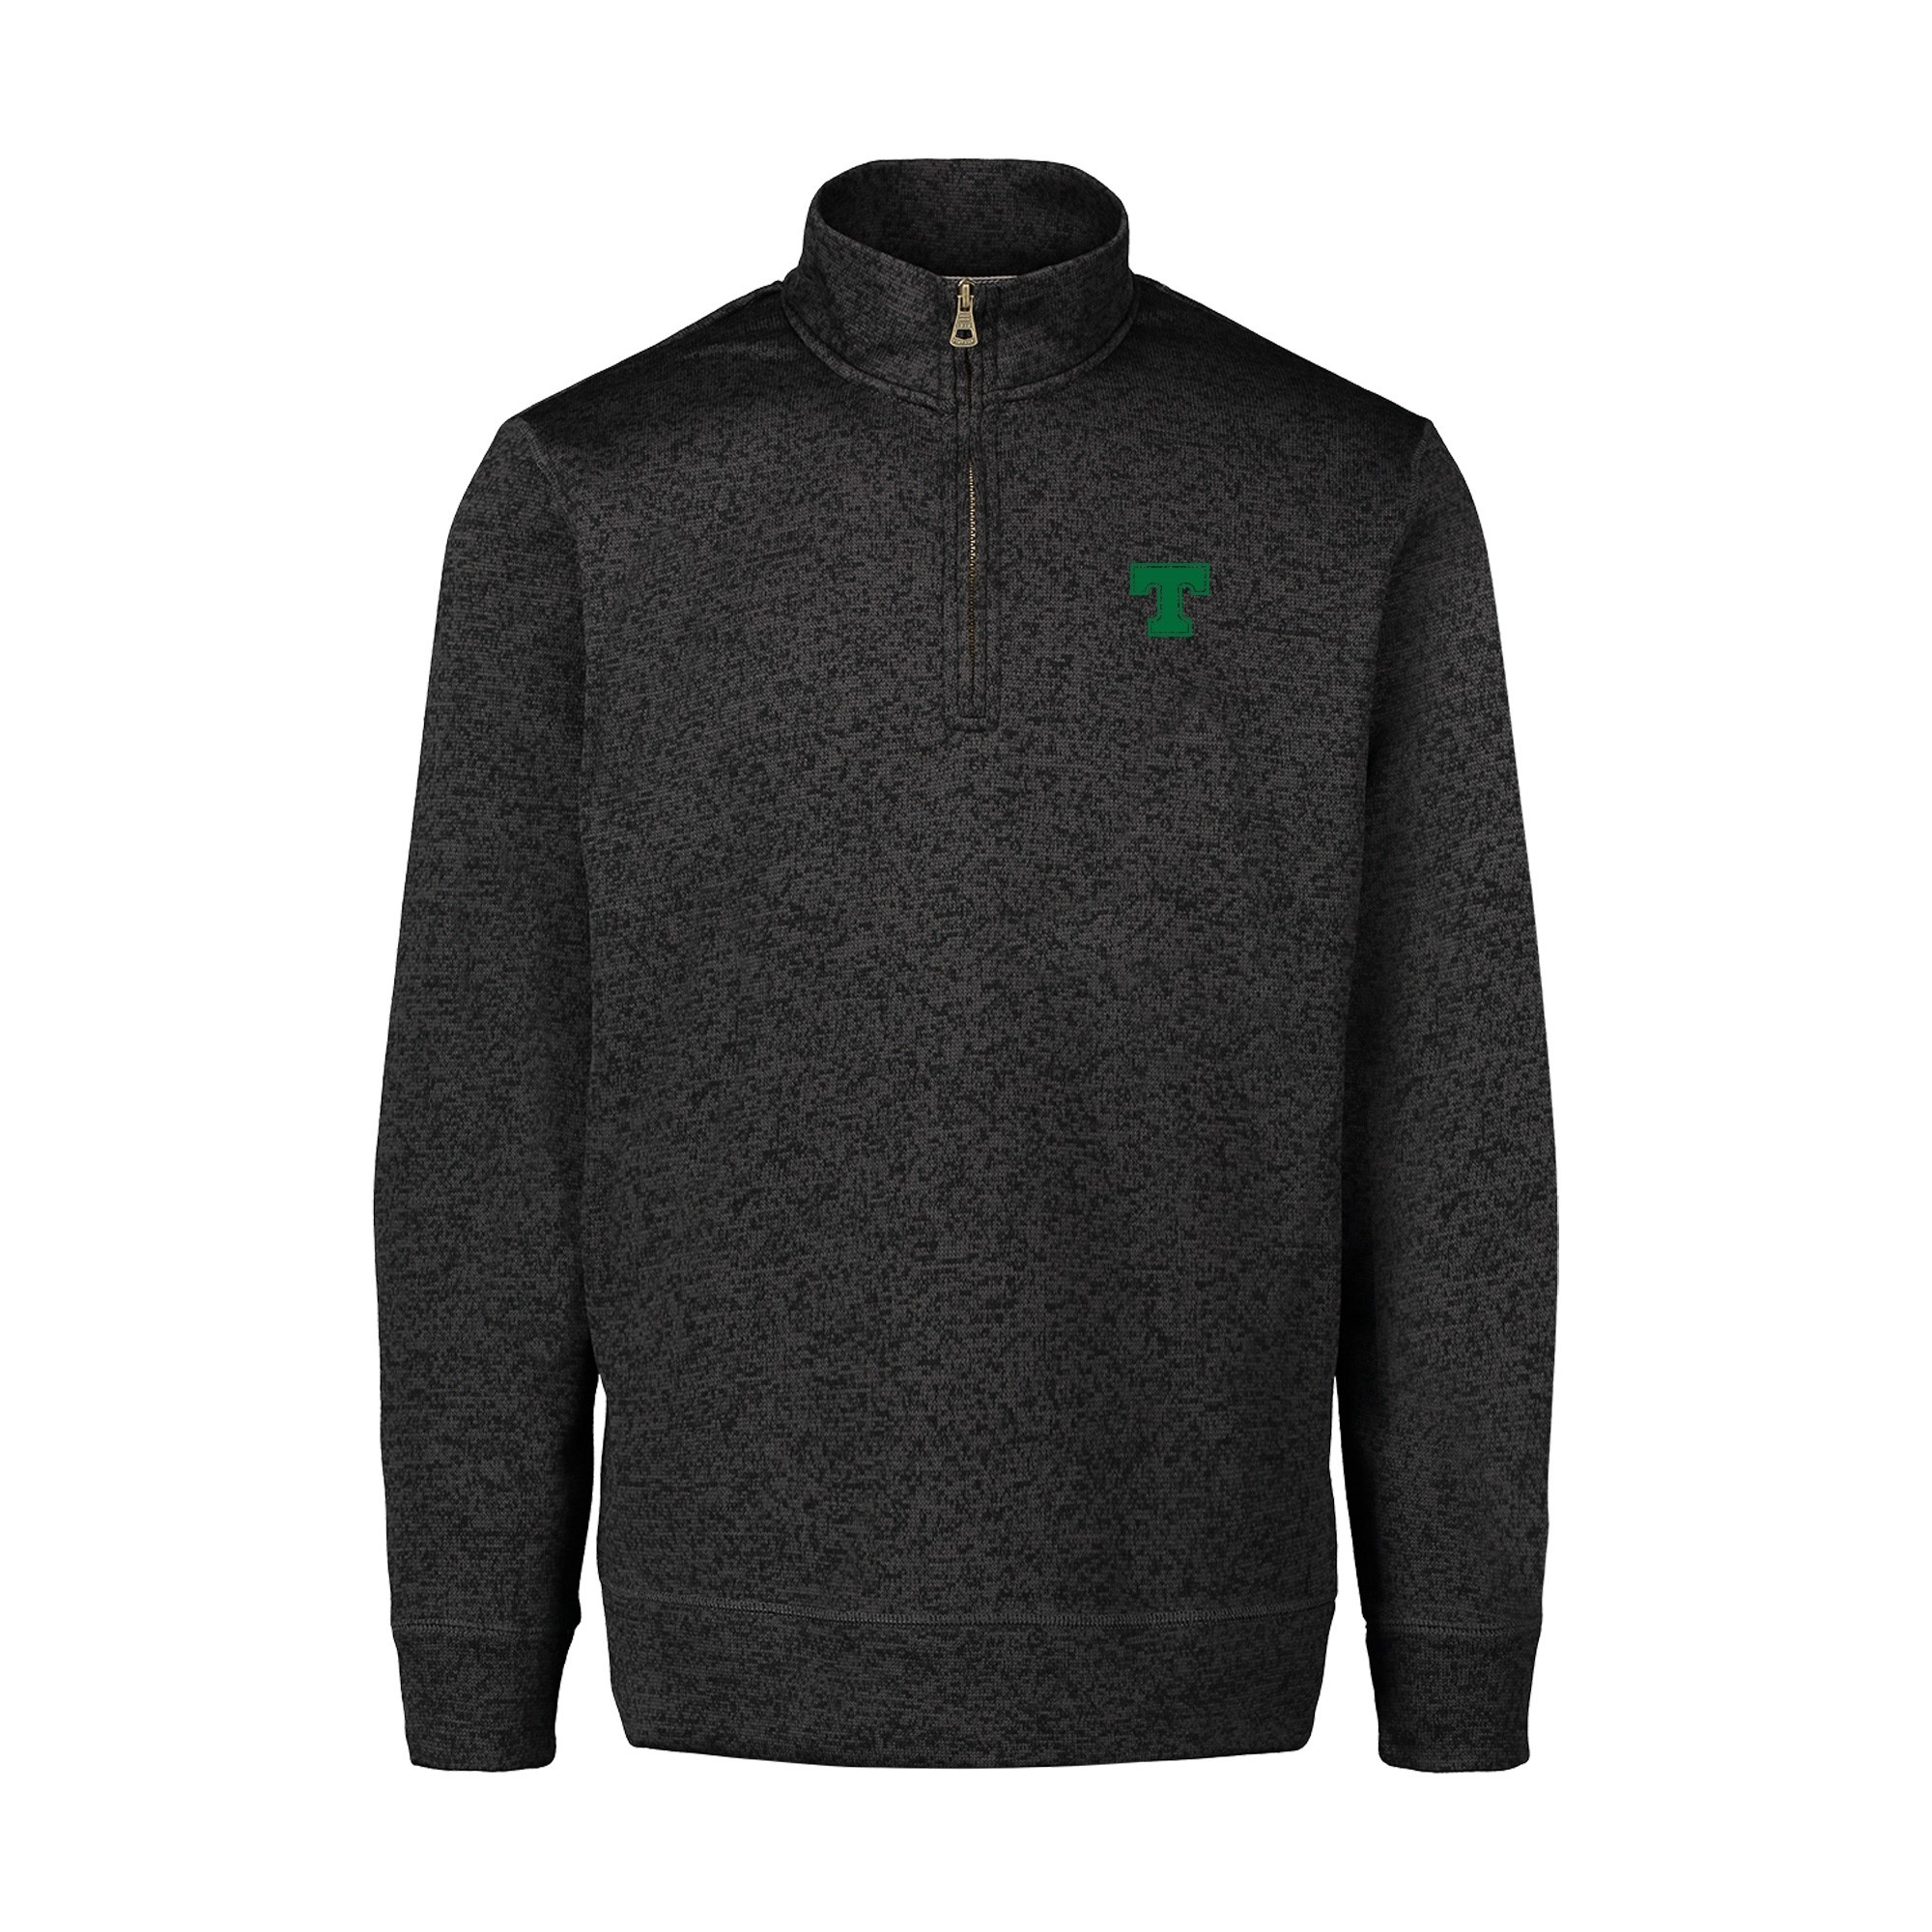 MV Sports Asphalt Vintage 1/4 Zip Sweater